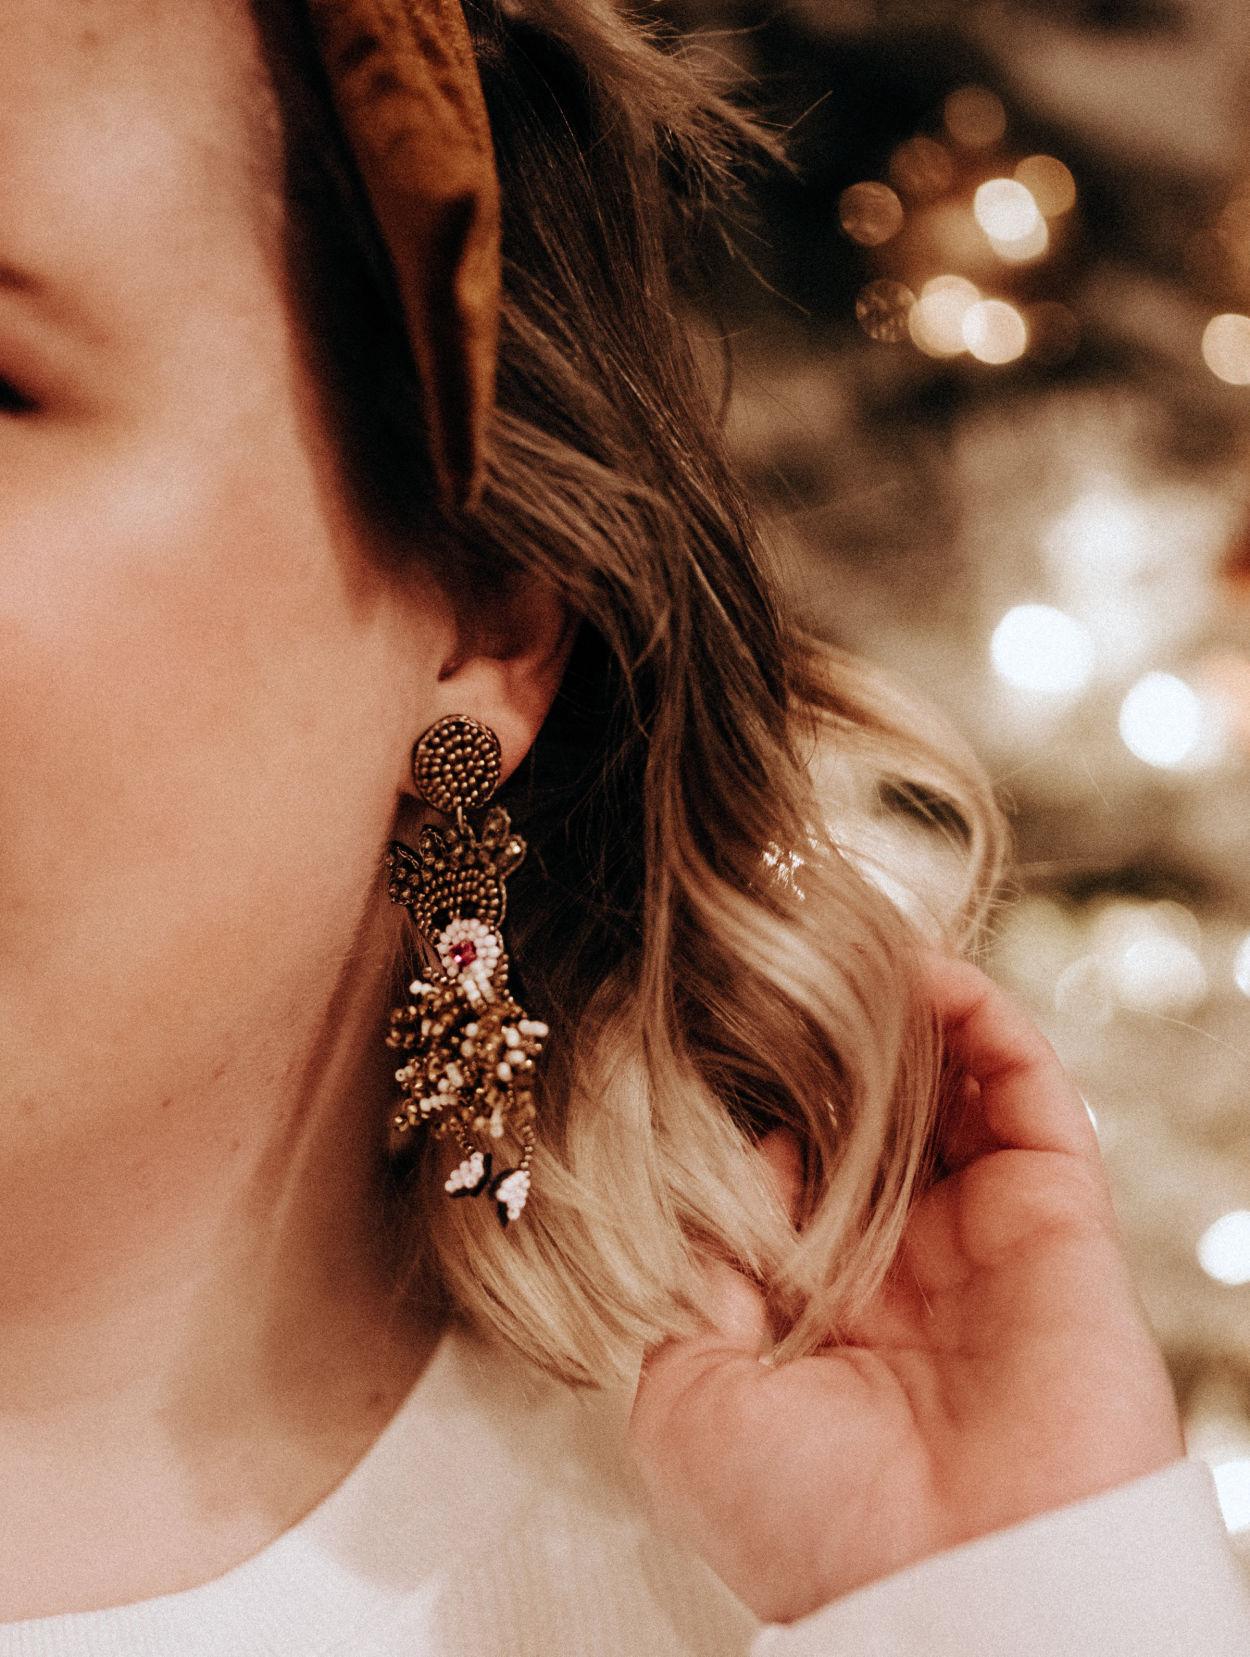 Accessories add seasonal cheer to loungewear